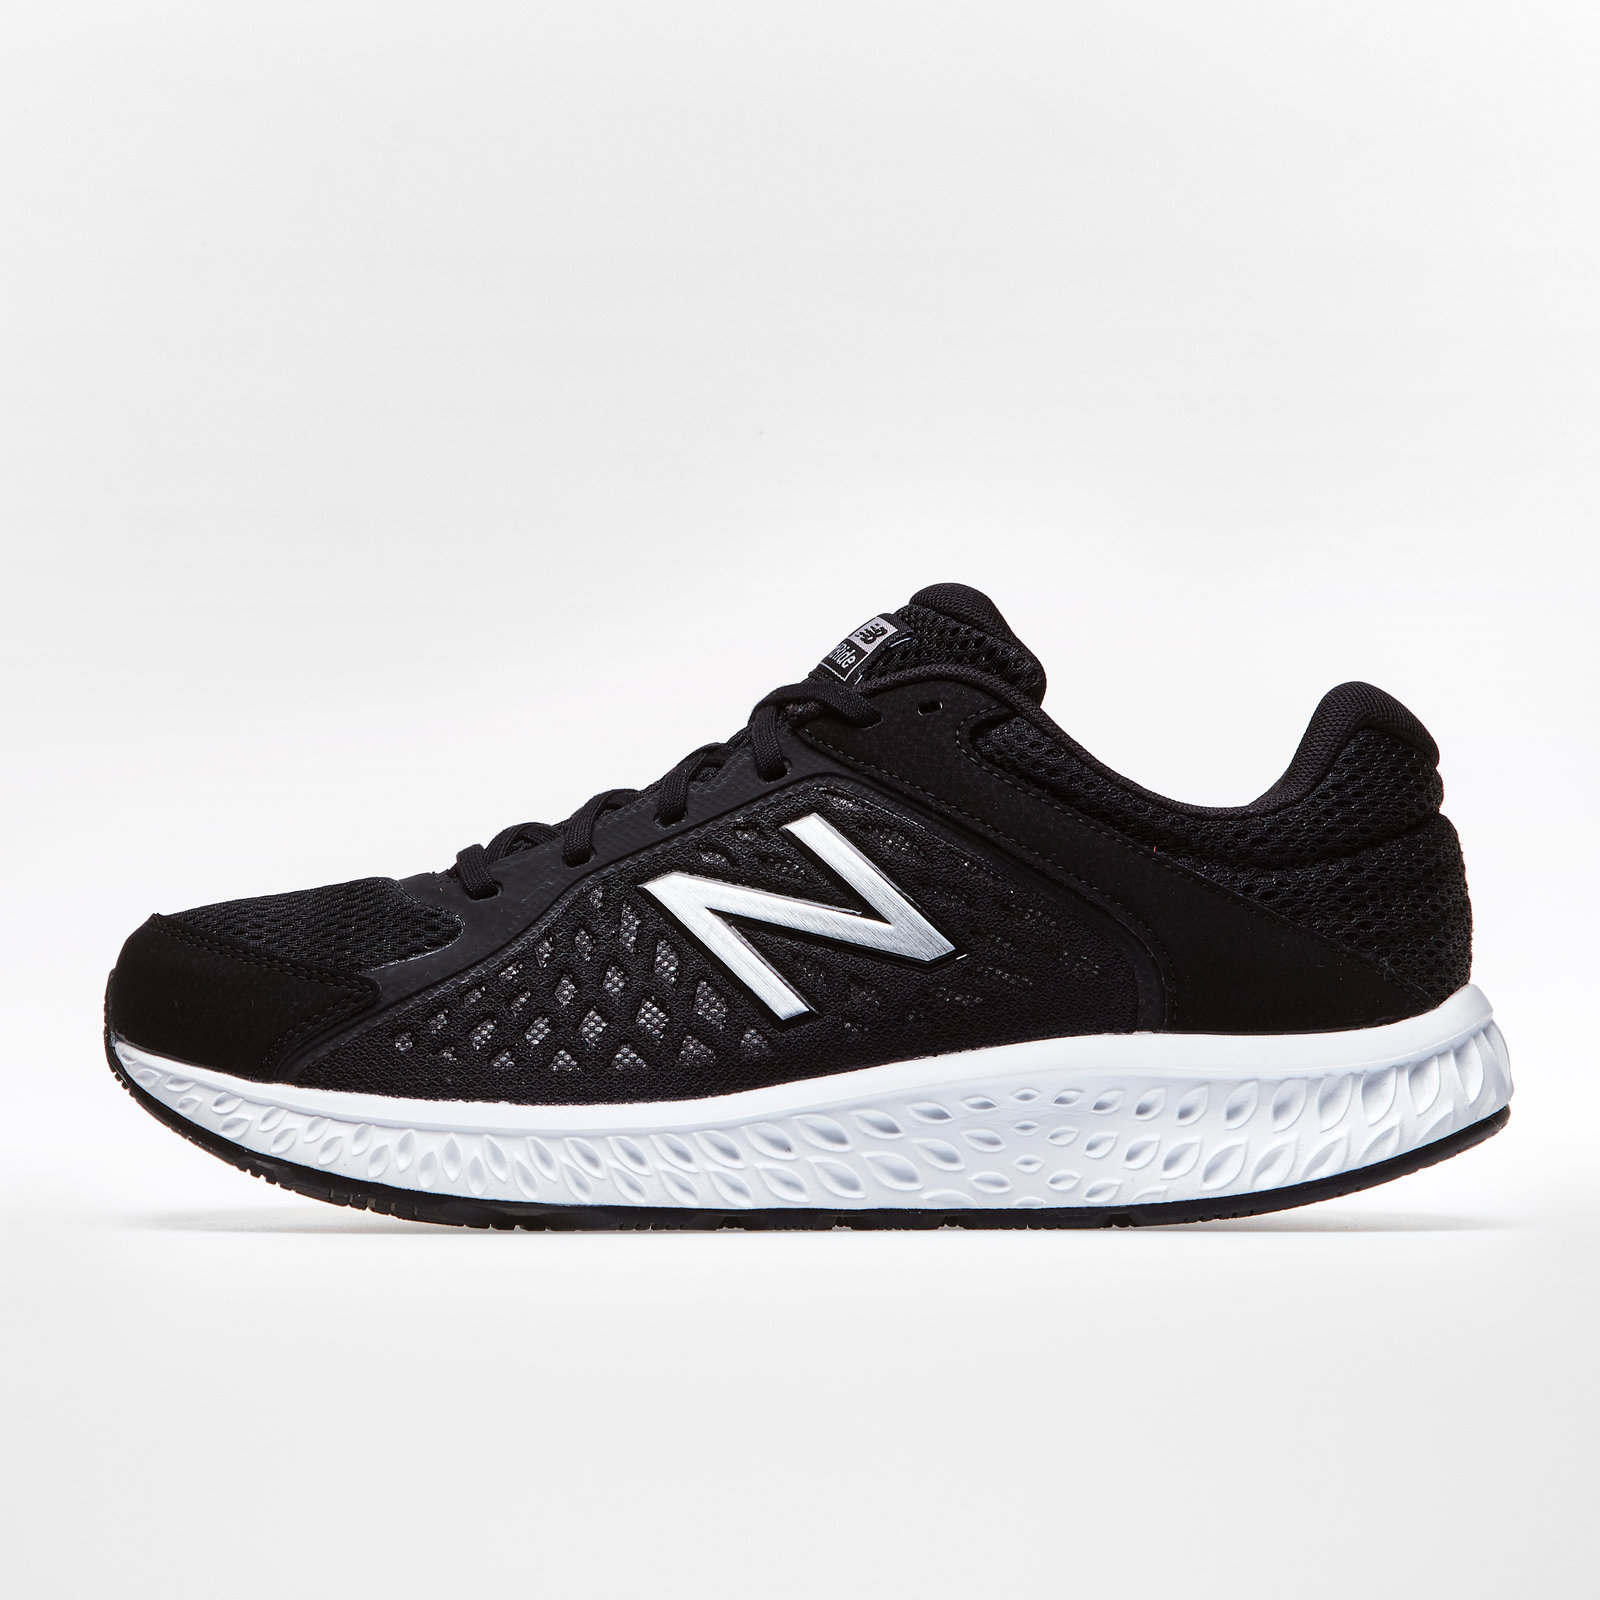 Image of 420 V4 Mens Running Shoes